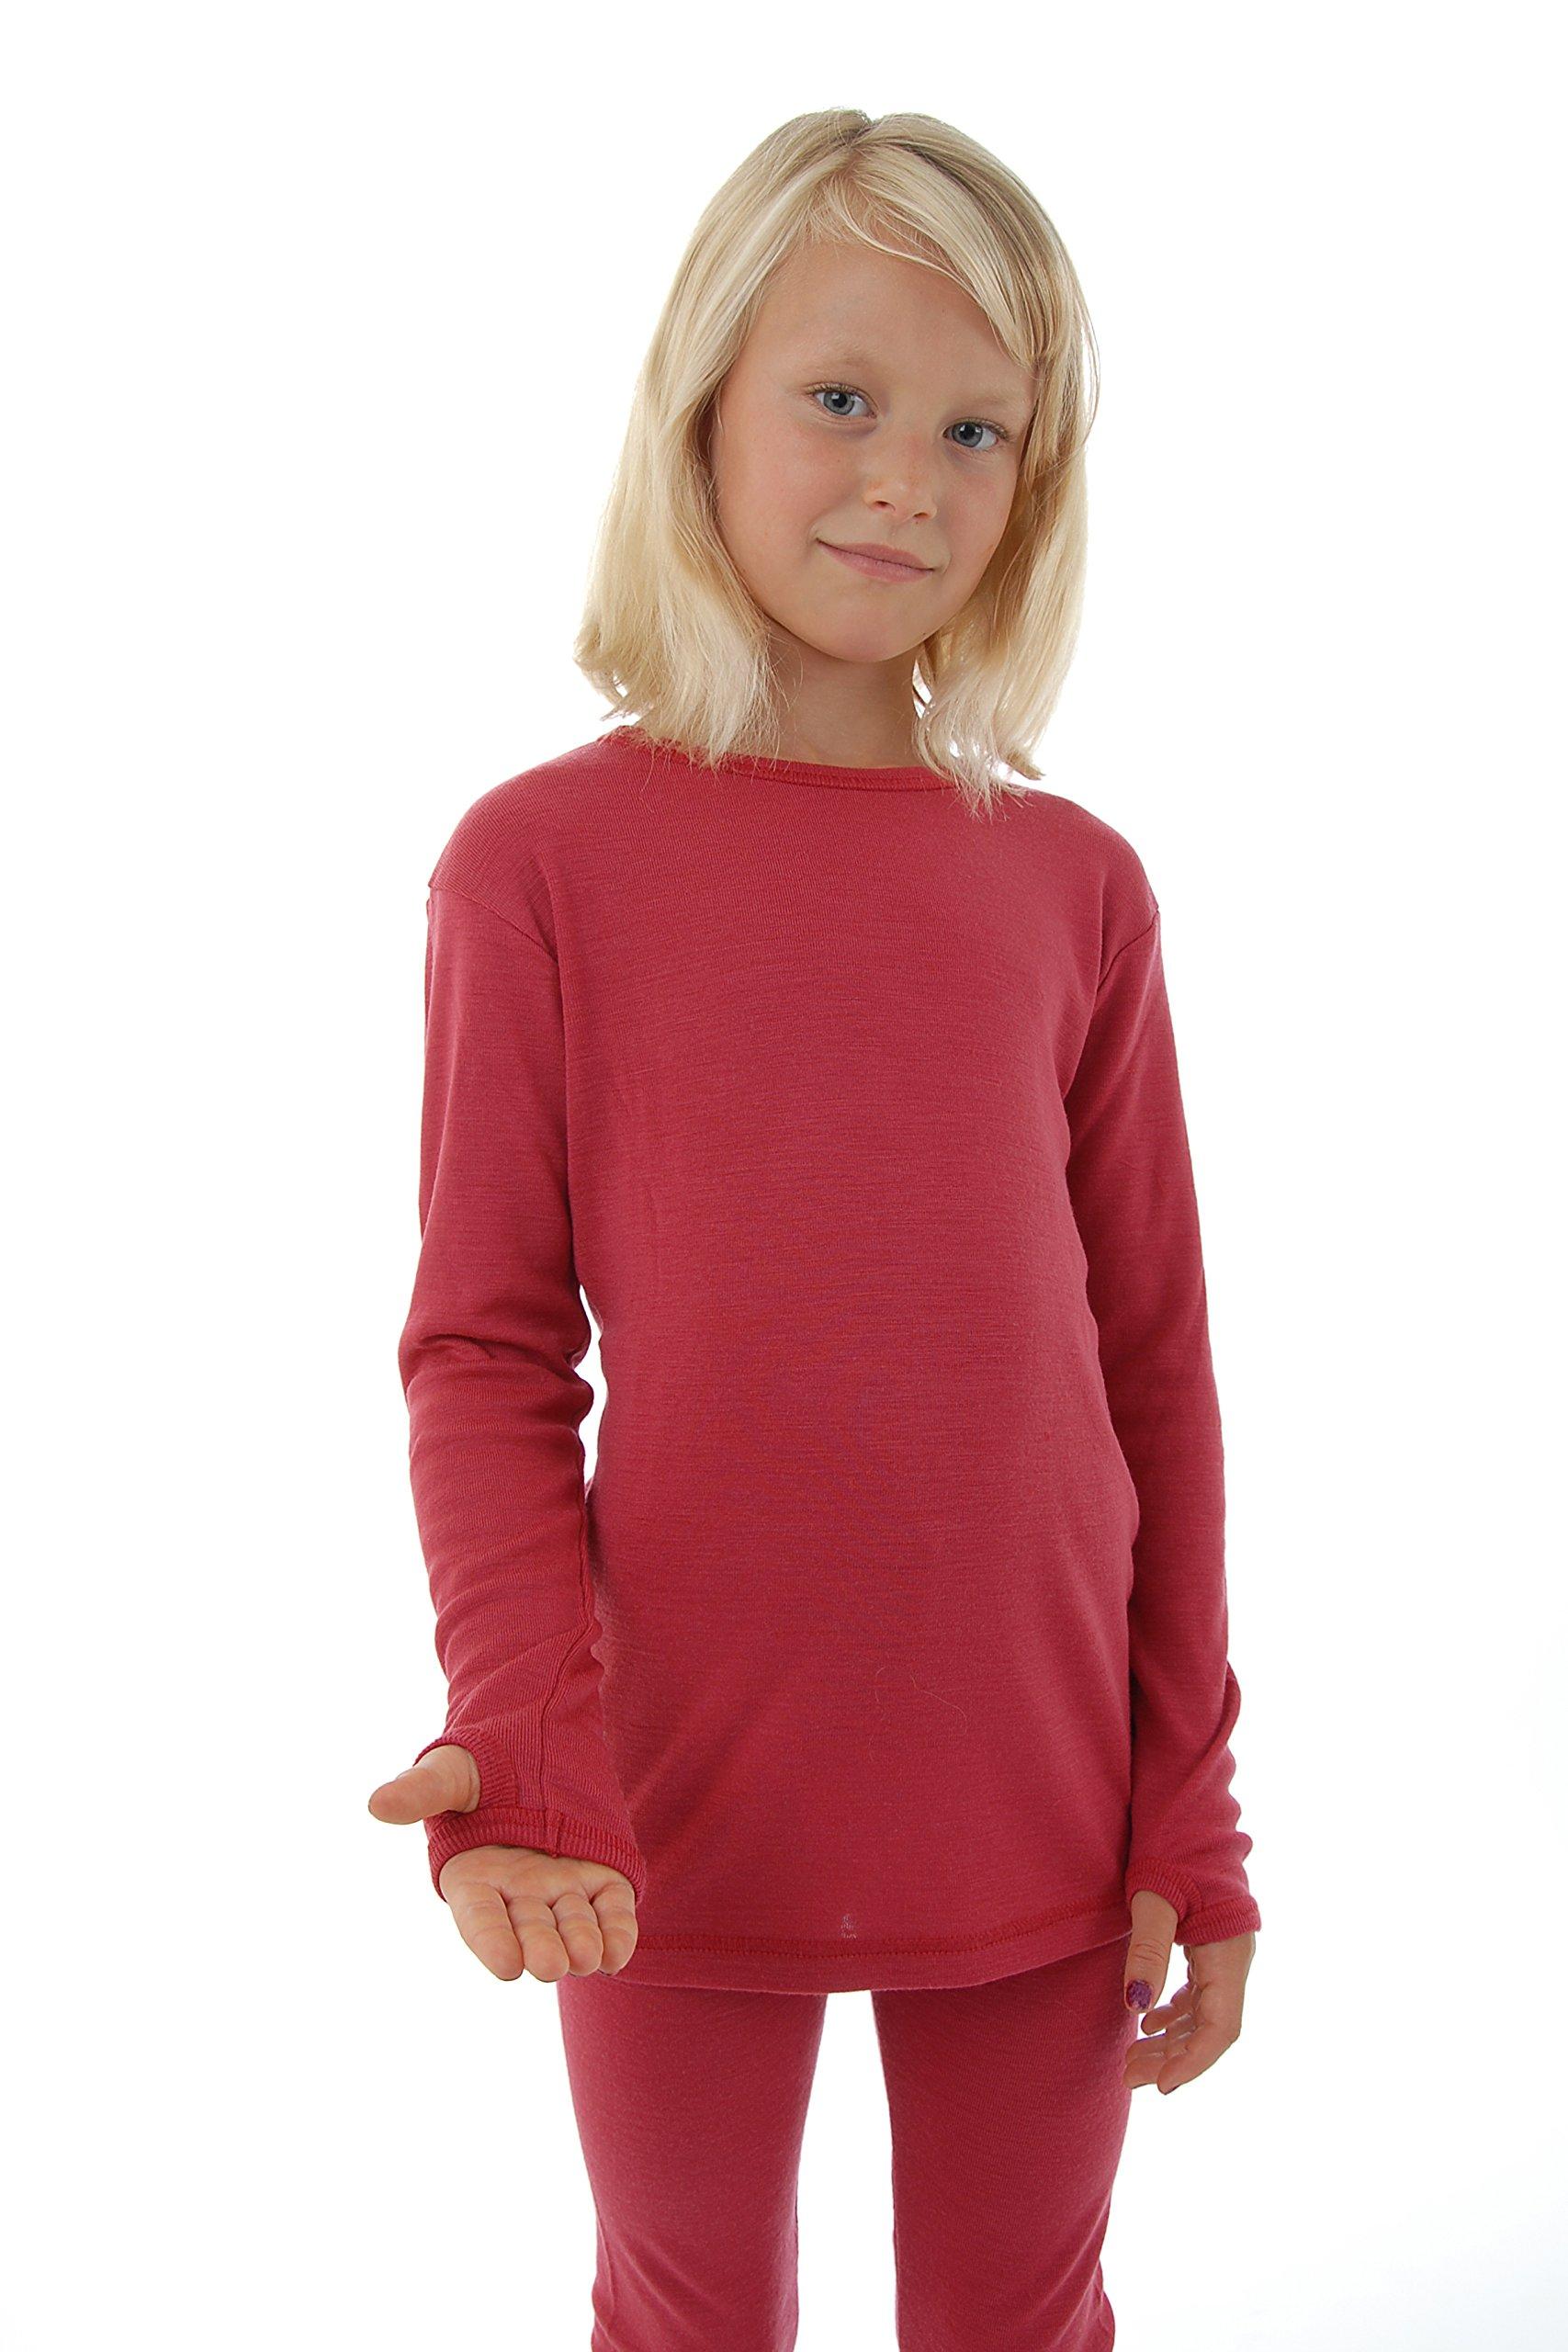 Pure Merino Wool Kids Thermal Top. Base layer Underwear Pajamas. BLUE 9-10 Yrs by Simply Merino (Image #4)